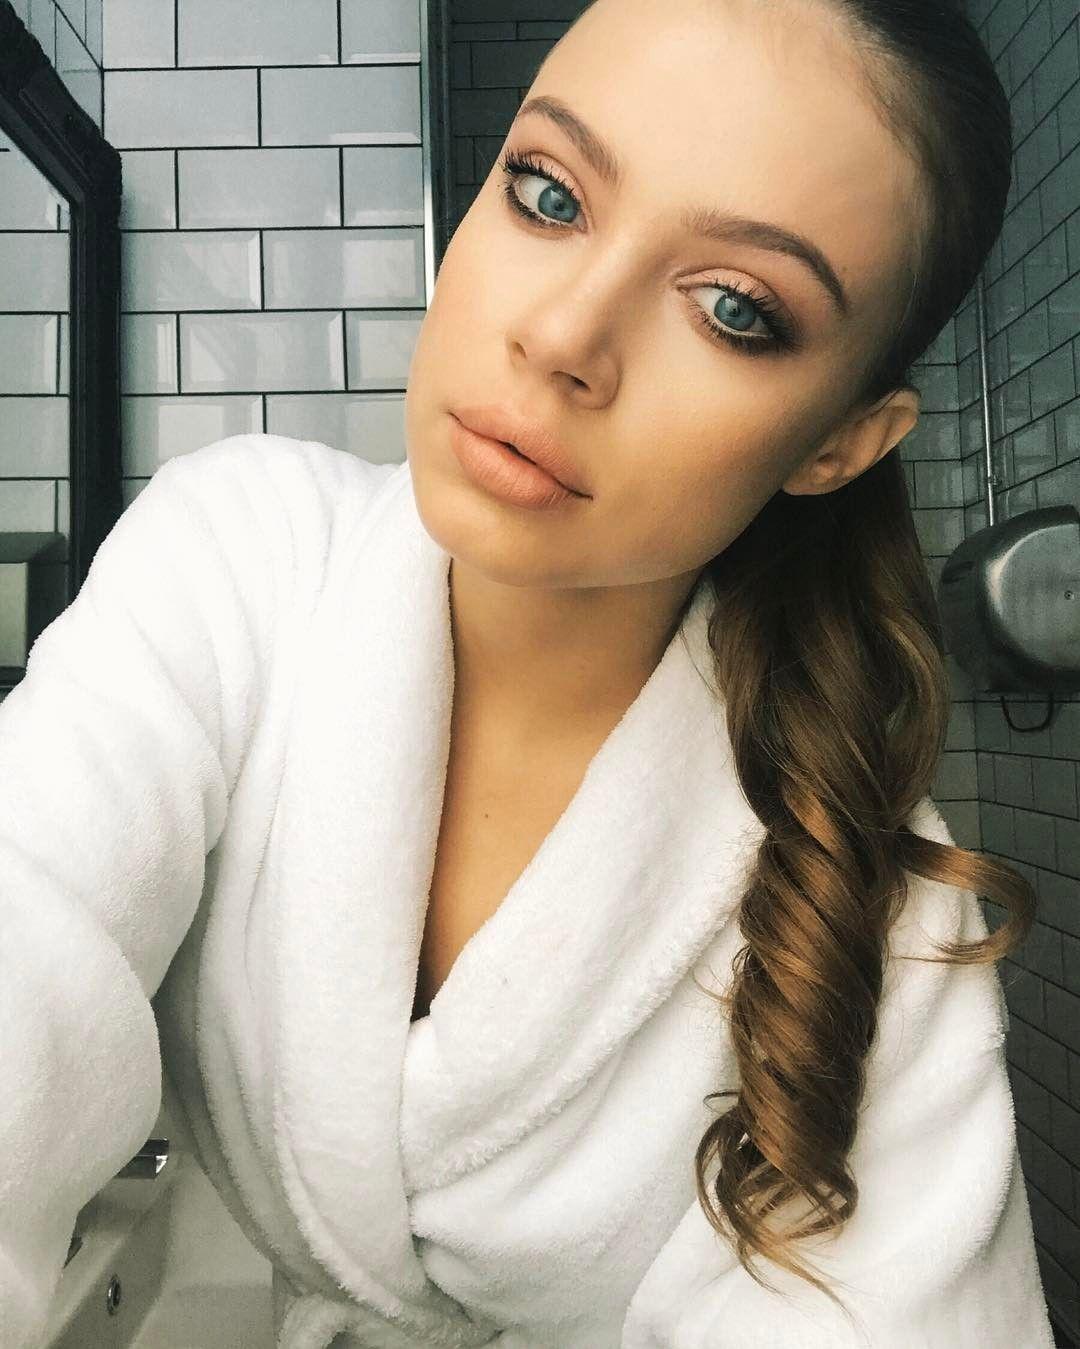 Celebrites Julz Goddard naked (27 foto and video), Pussy, Hot, Twitter, underwear 2020